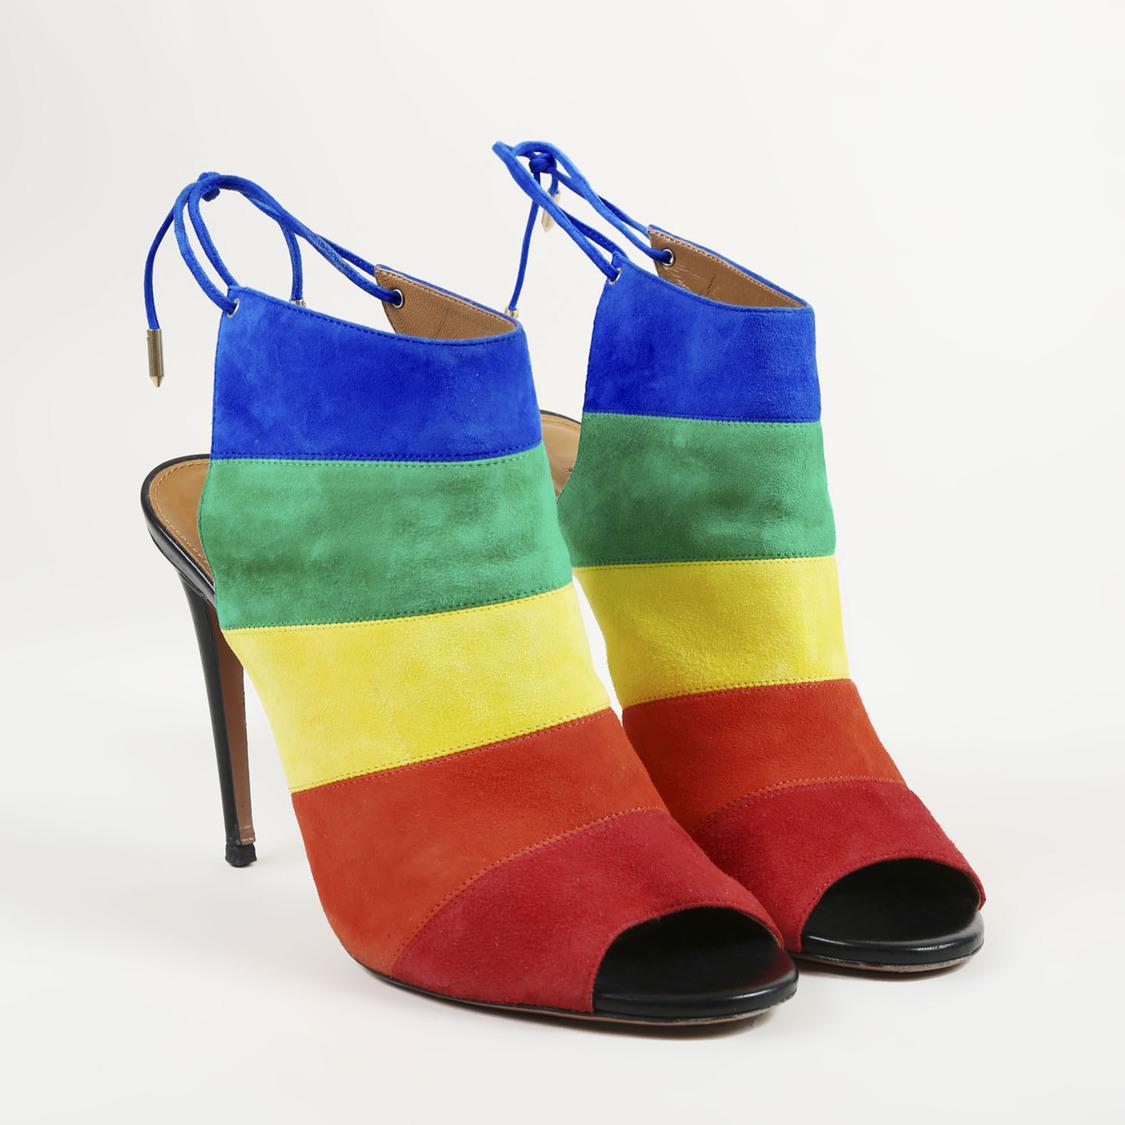 845c9019ac7 Aquazzura Multicolor Suede Rainbow Striped Open Toe Pumps - Lyst